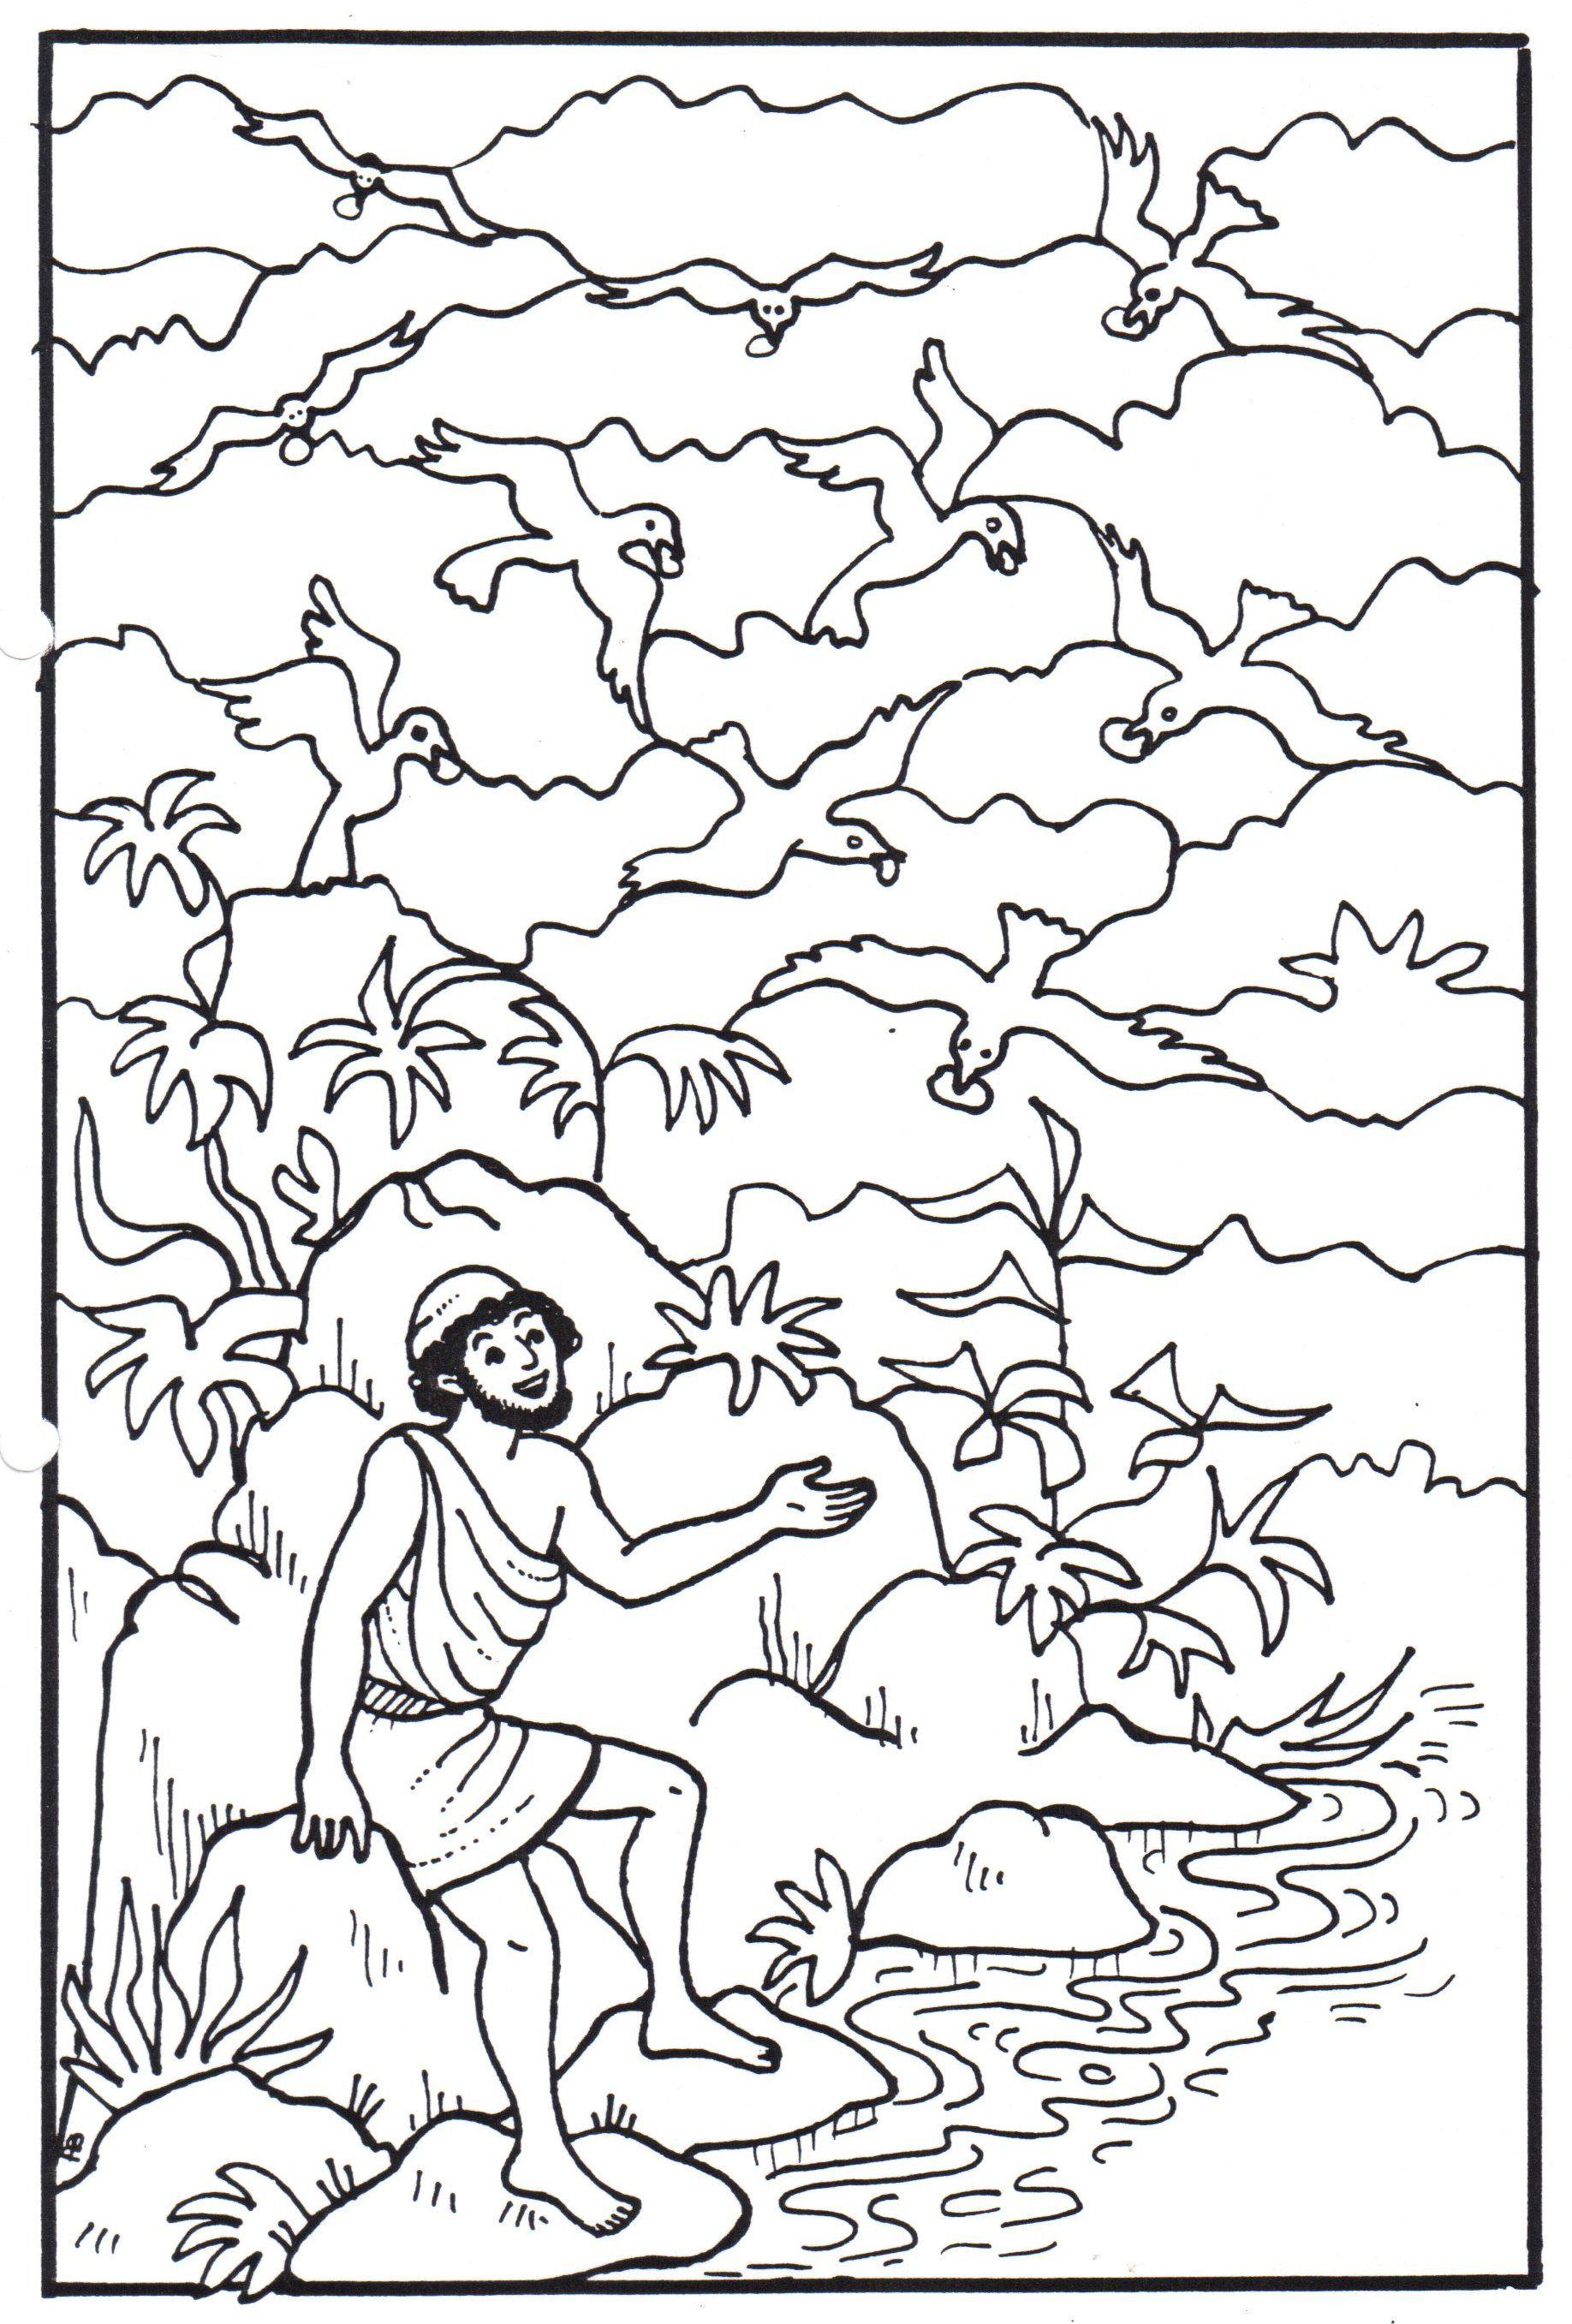 Elijah and the ravens | God: BCM - Elijah | Pinterest | Ravens ...